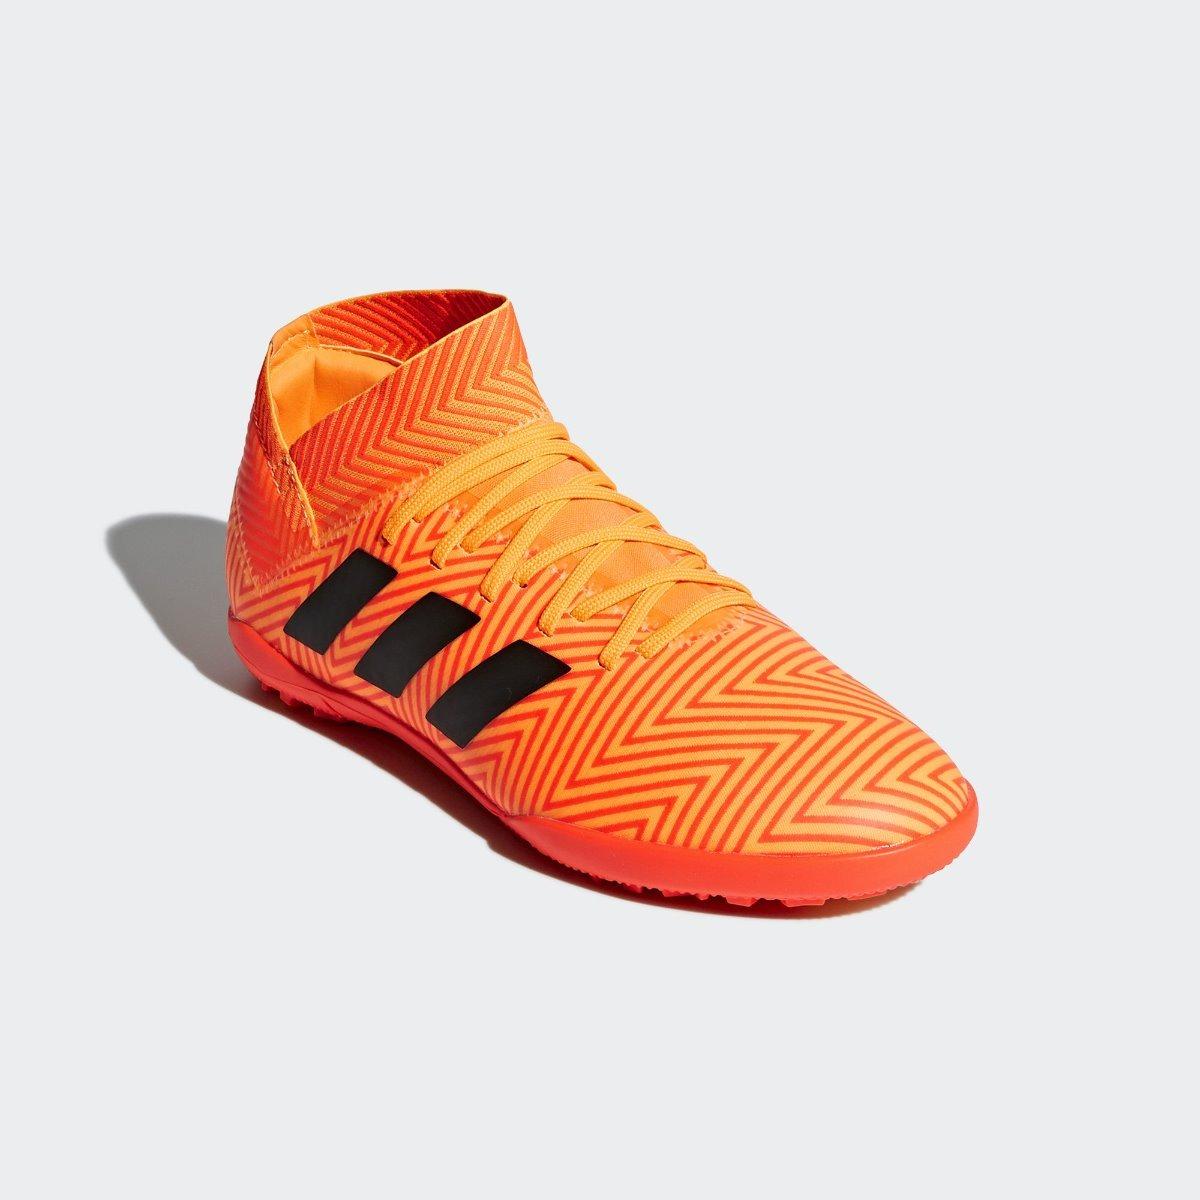 Tenis adidas Nemeziz Tango 18.3 Turf Naranja Niño